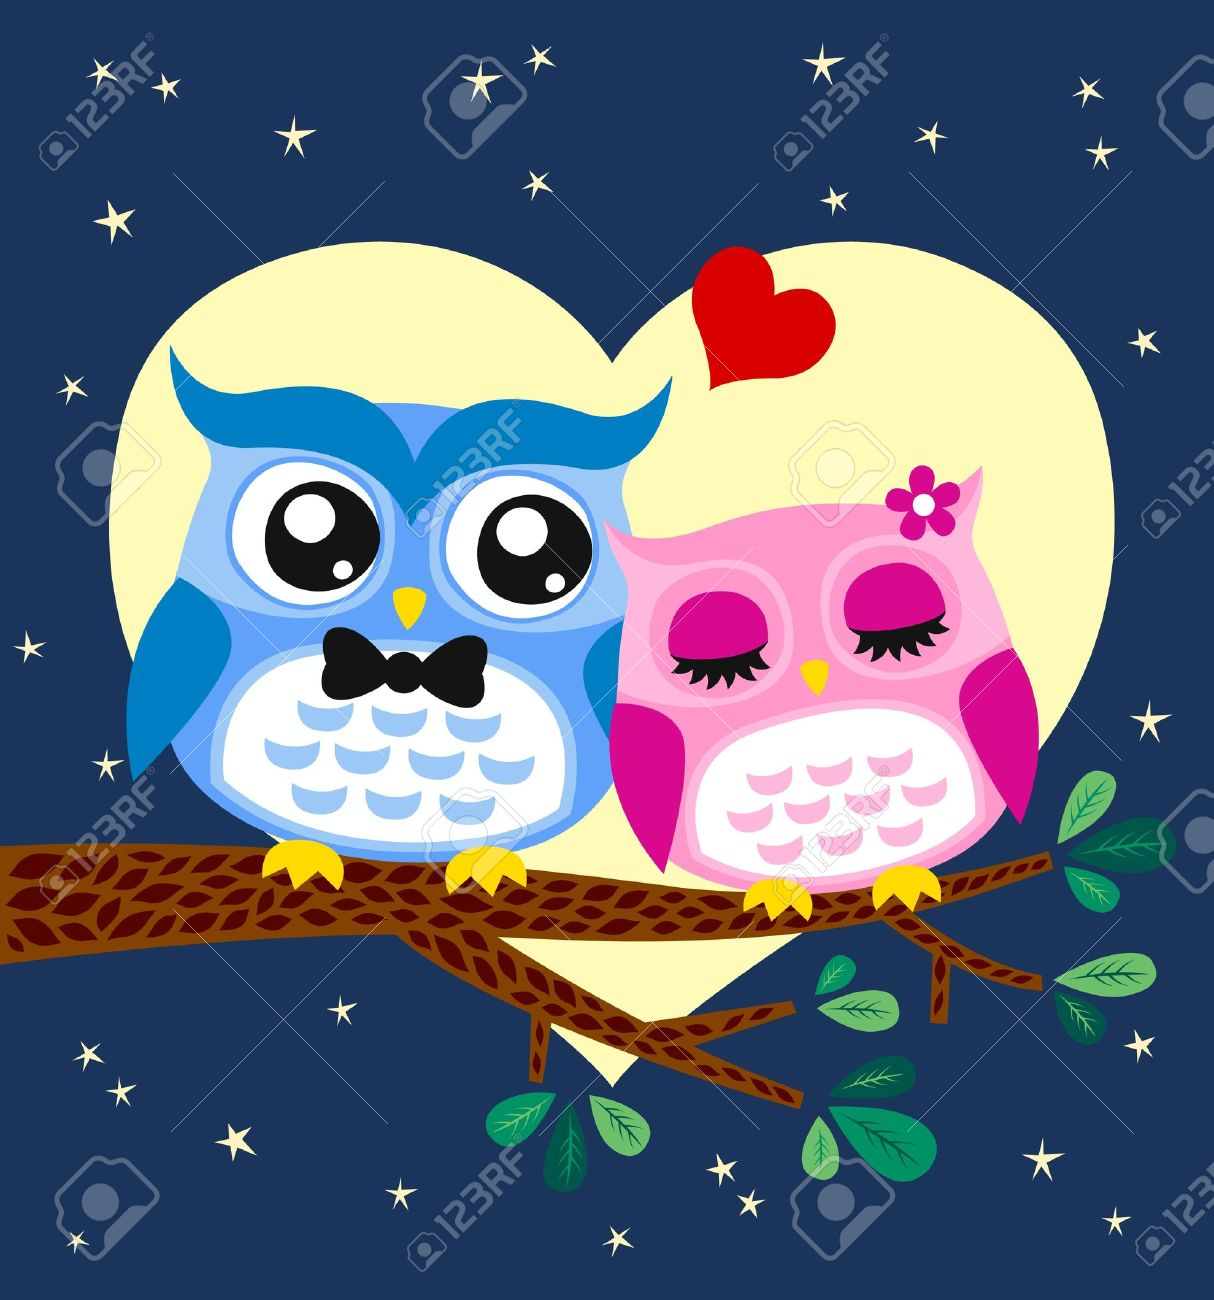 owl couple illustration Stock Vector - 14557851